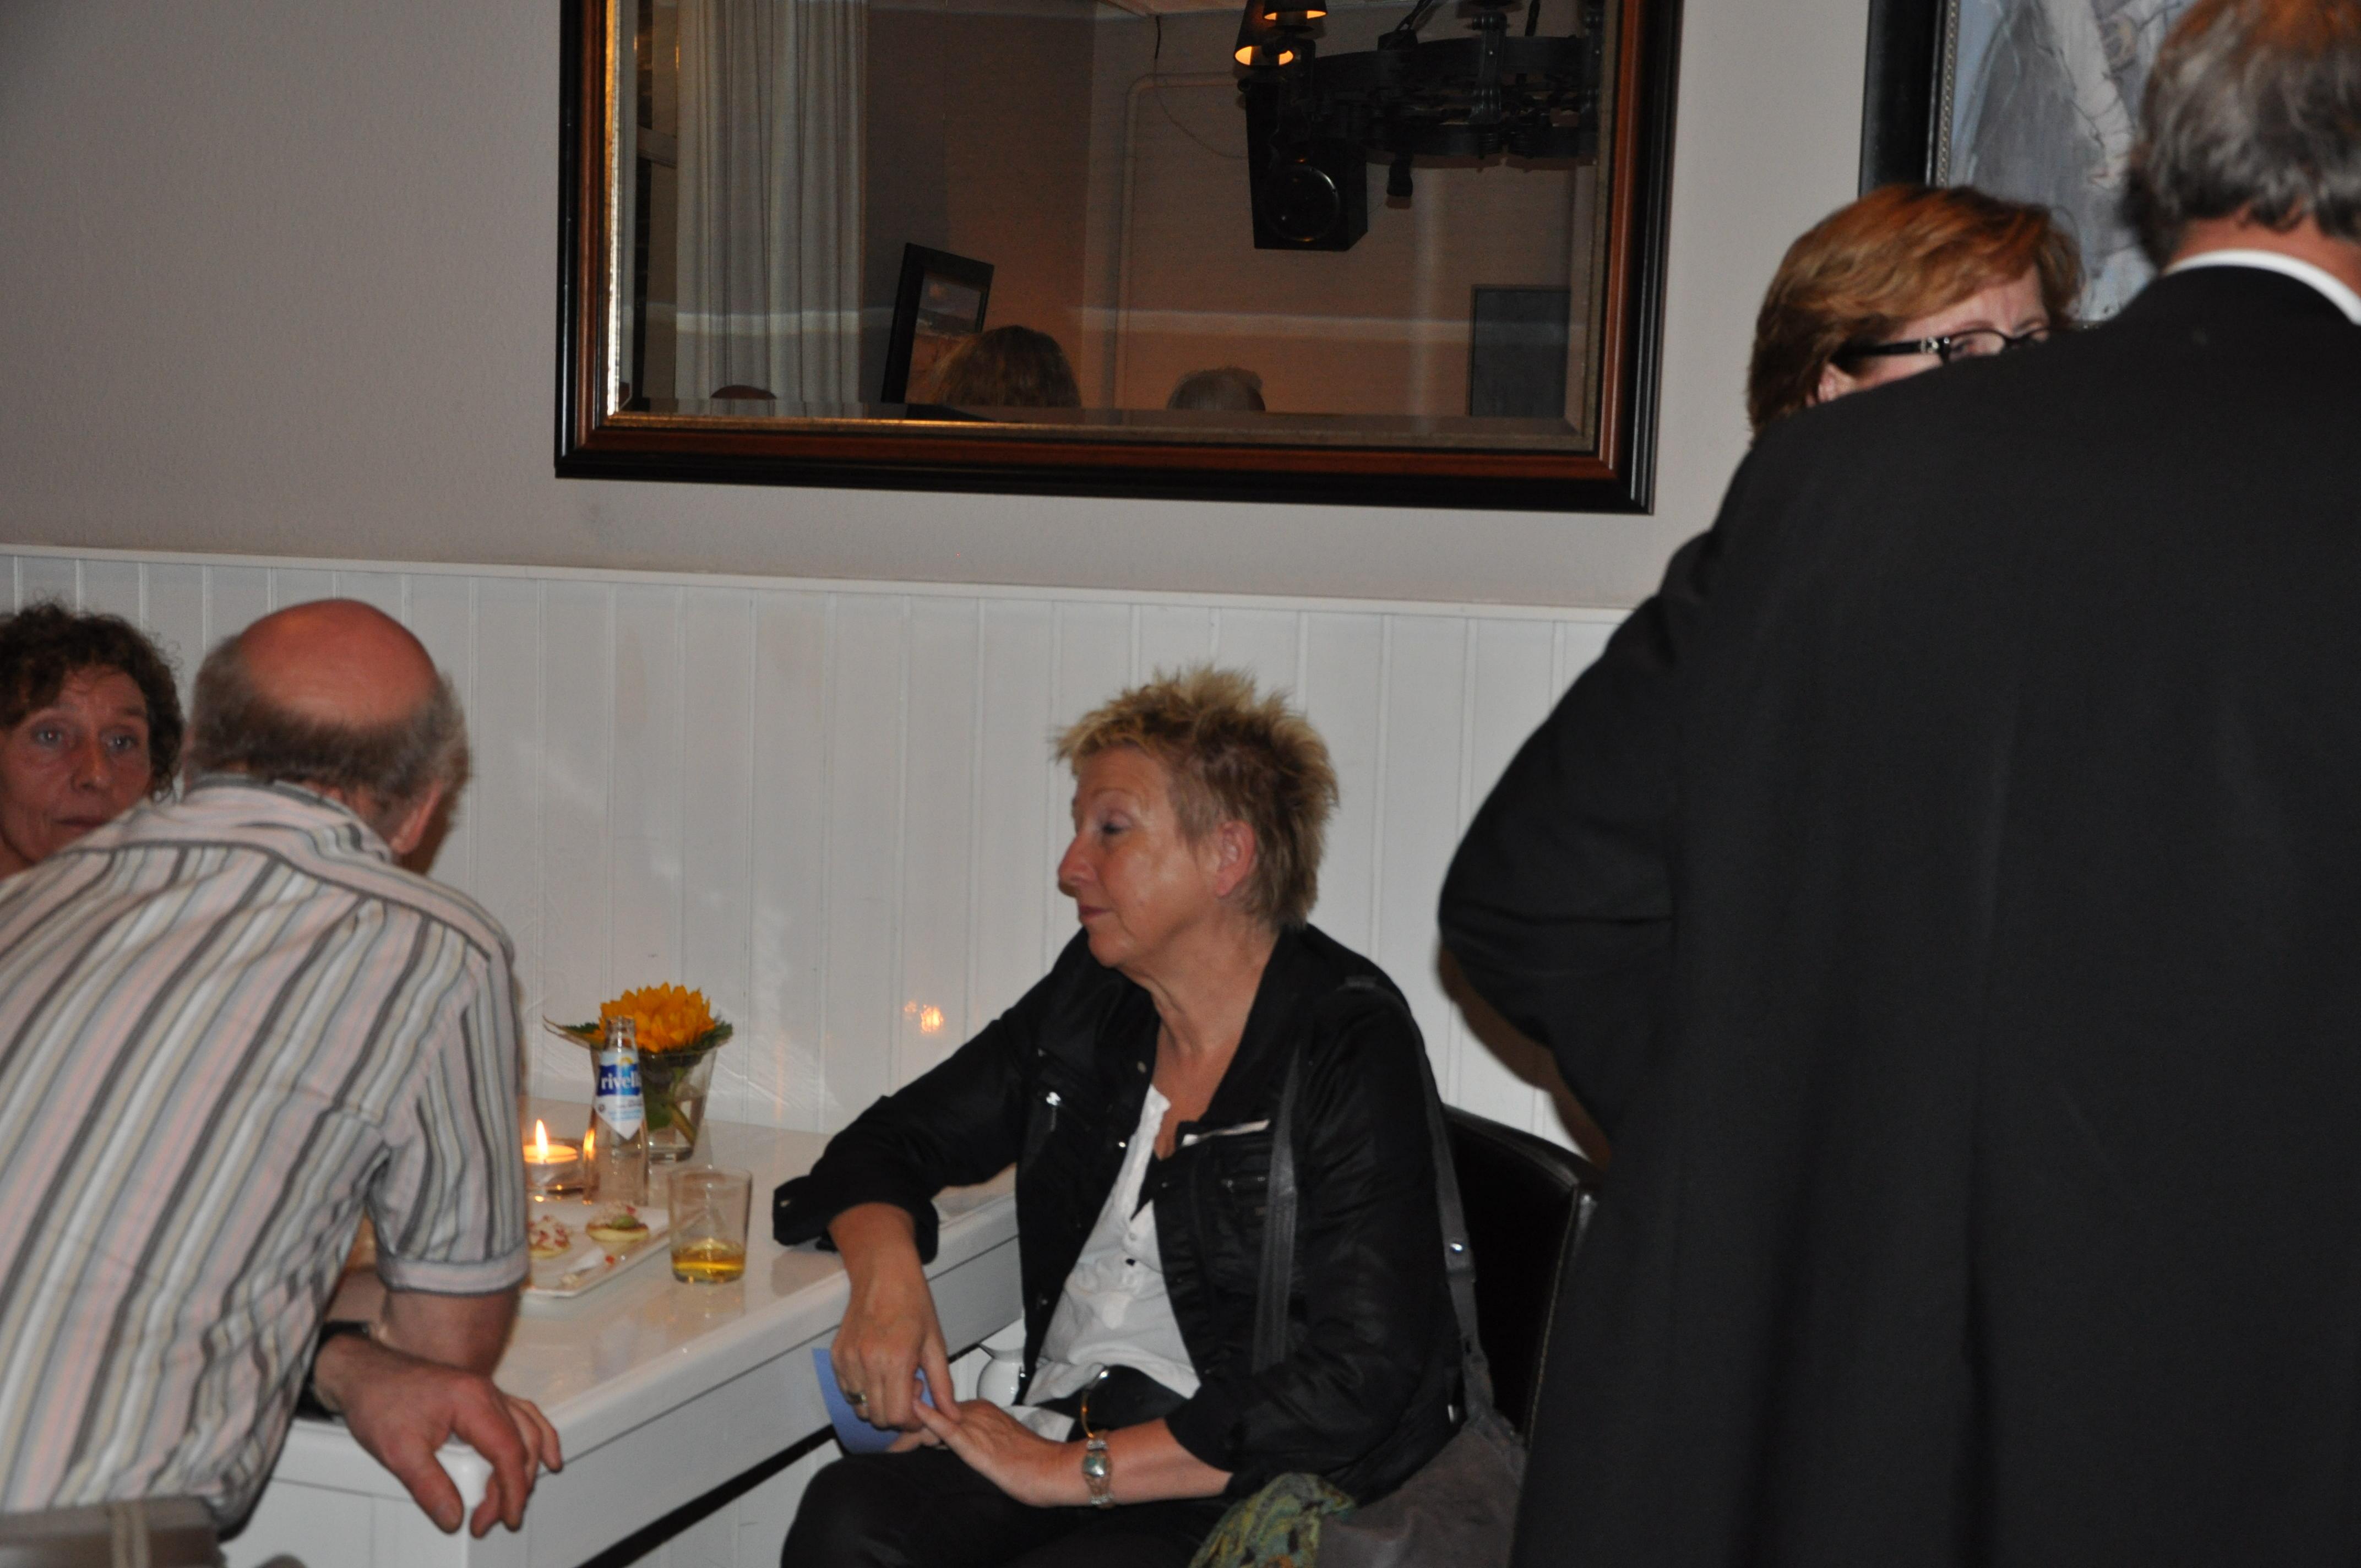 singlecafe in brasserie van Rest.Kawop,Markt 23,Lochem 5-10-13